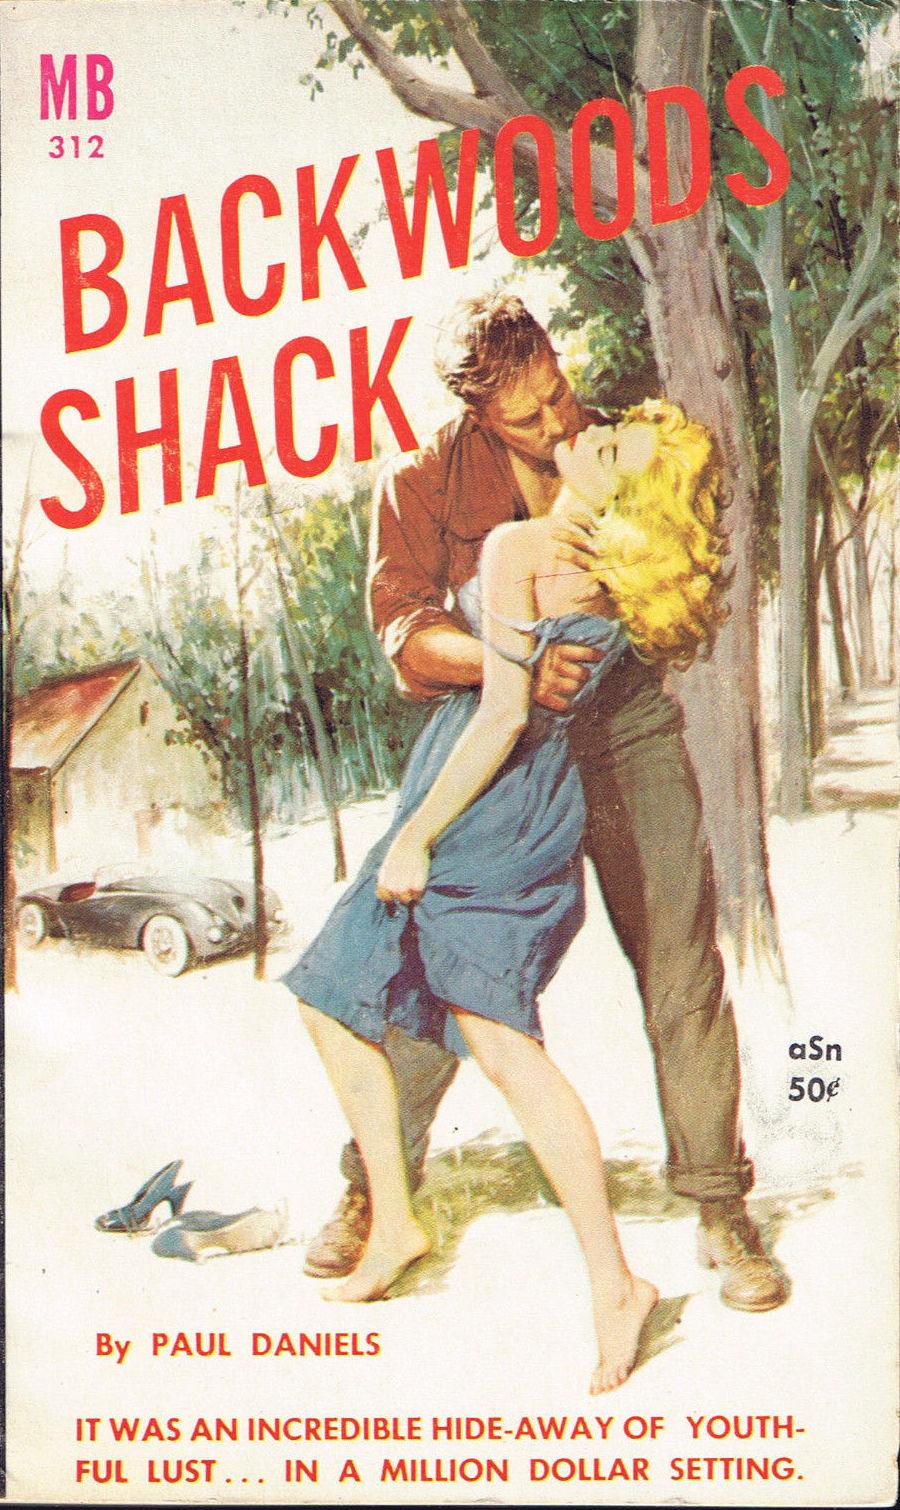 Lust shack